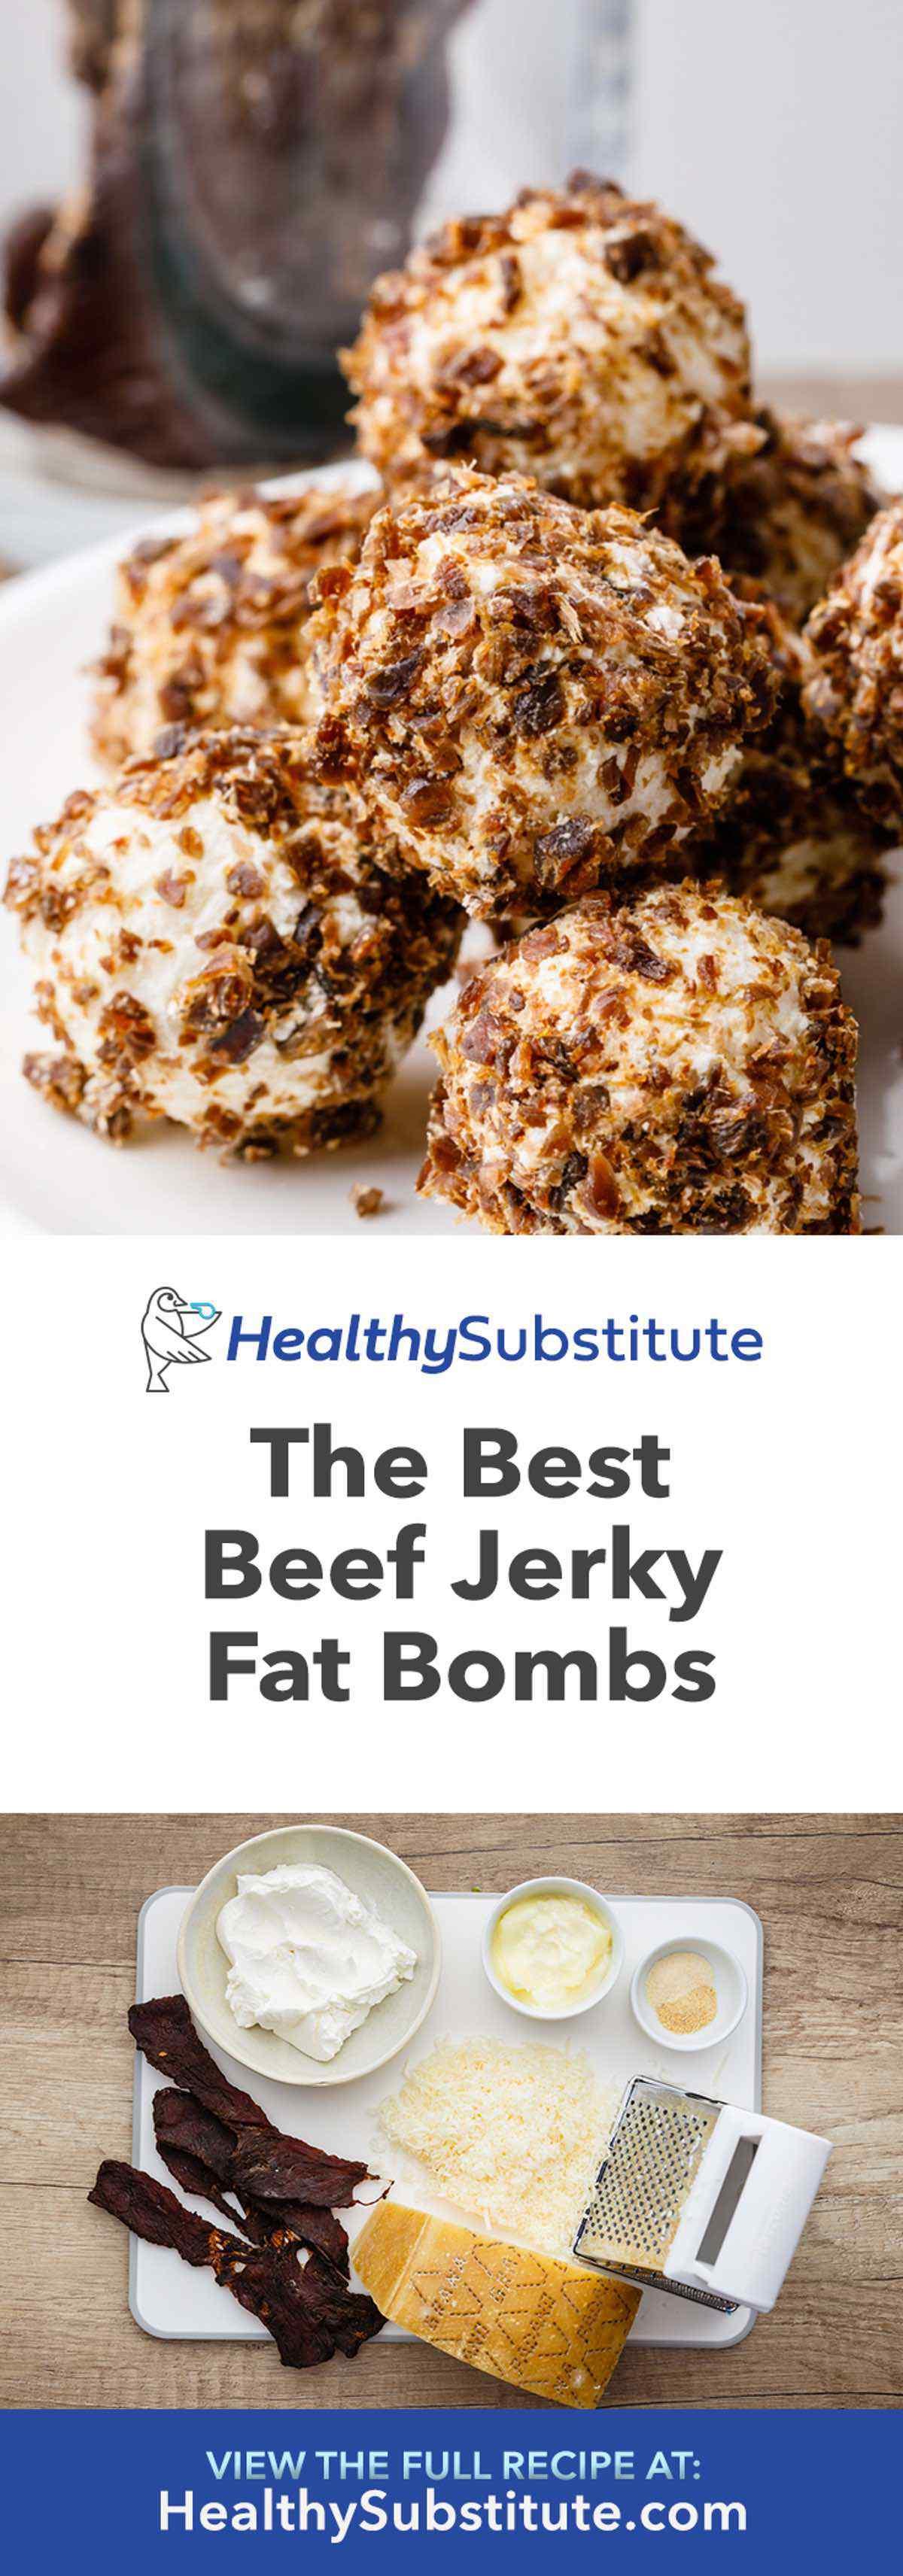 Savory Fat Bombs